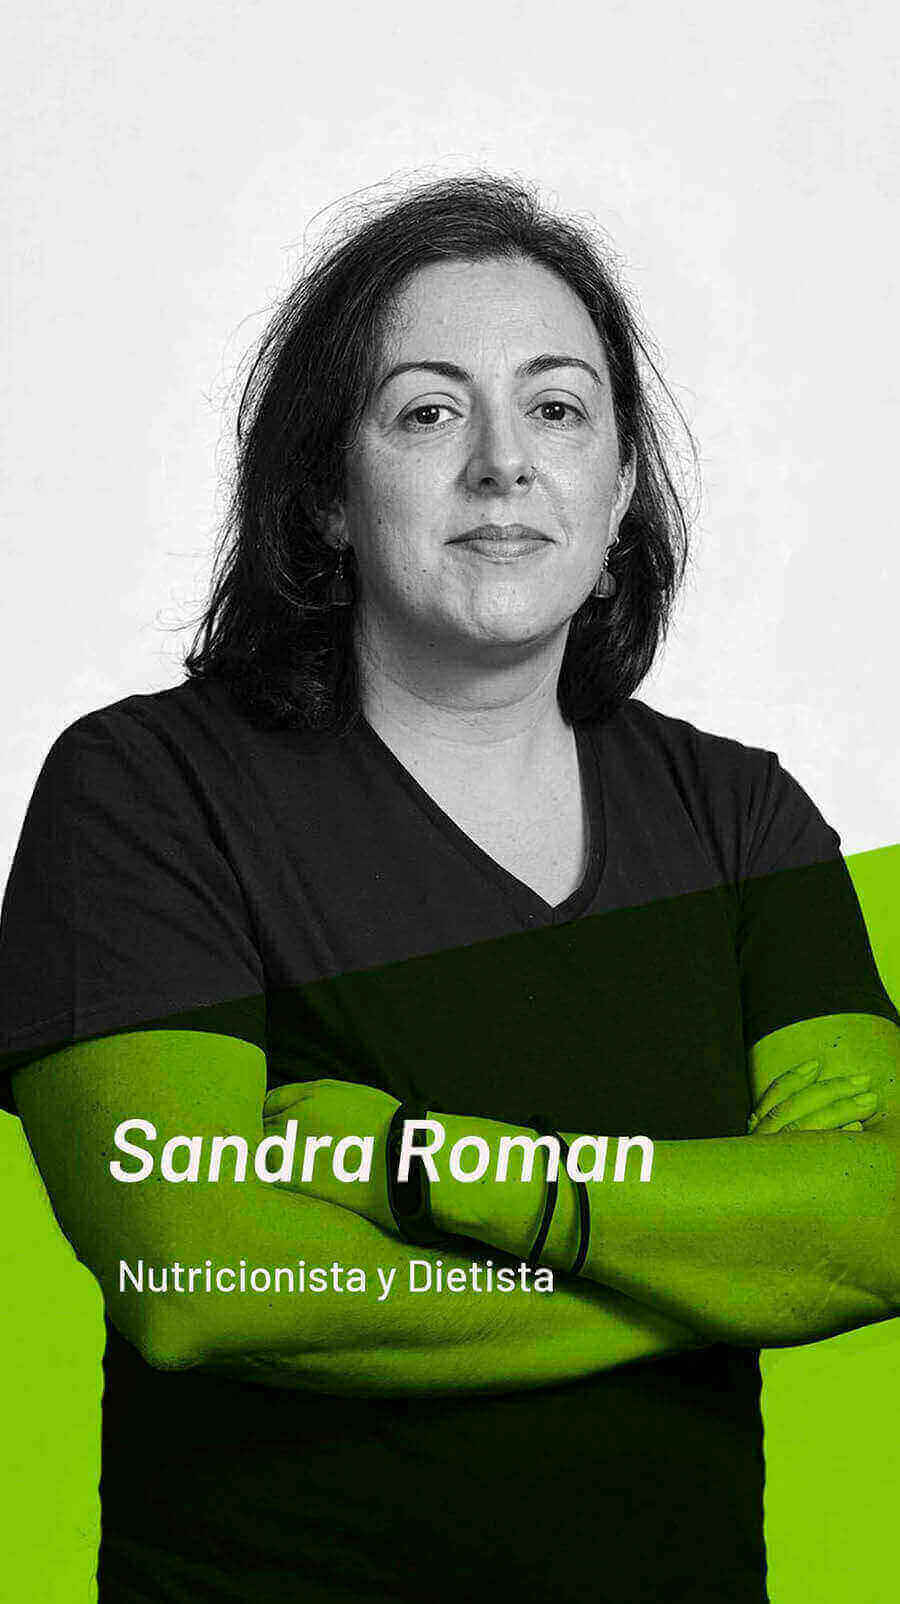 fotografia de nuestra nutricionista sandra román